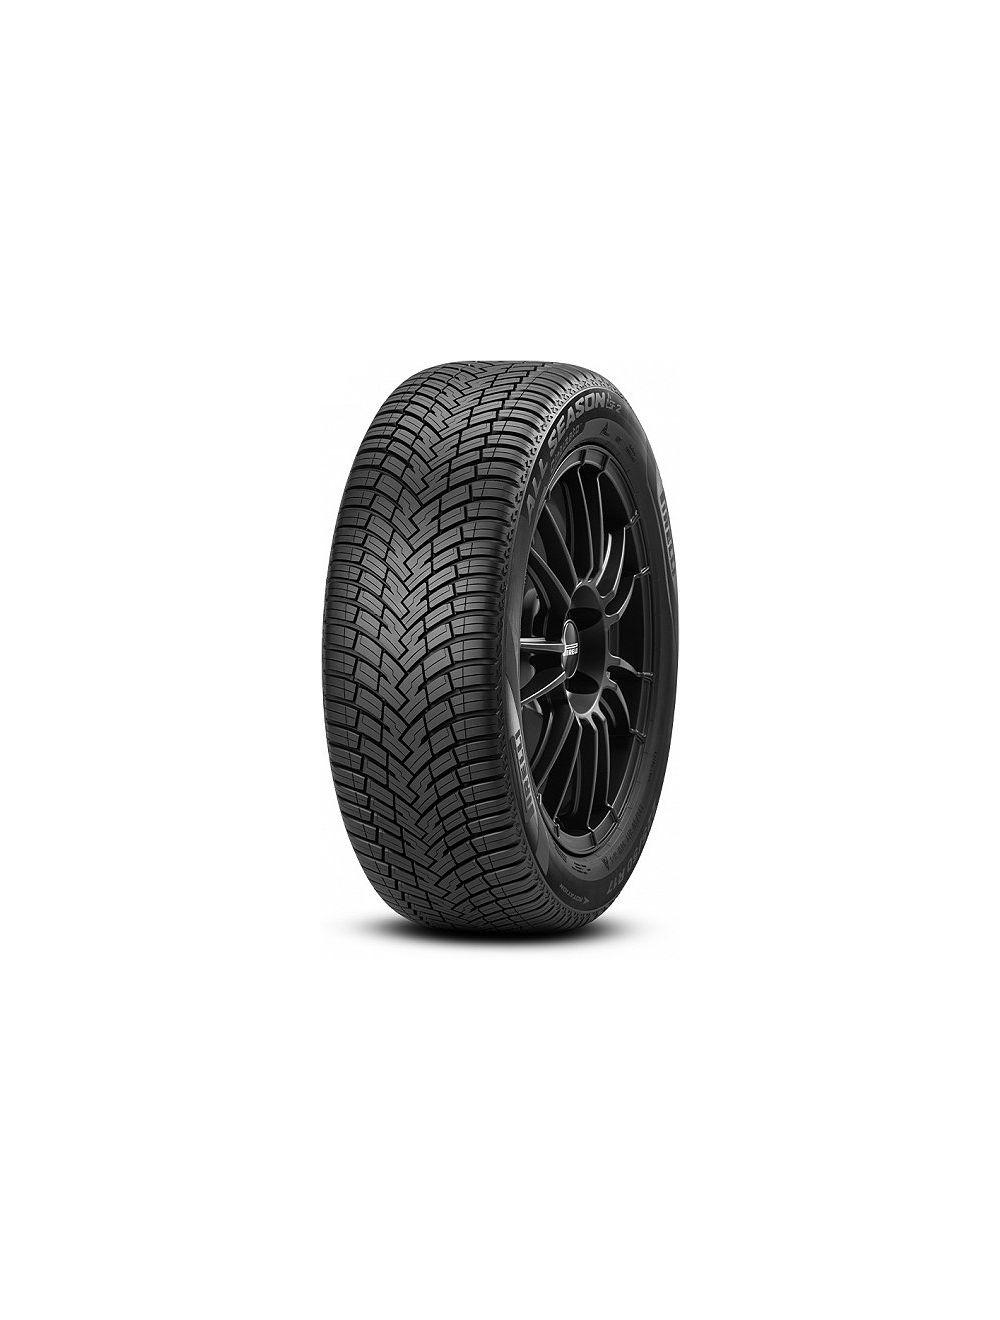 Pirelli 225/60R17 V Cinturato All Season SF2 XL Négyévszakos gumi